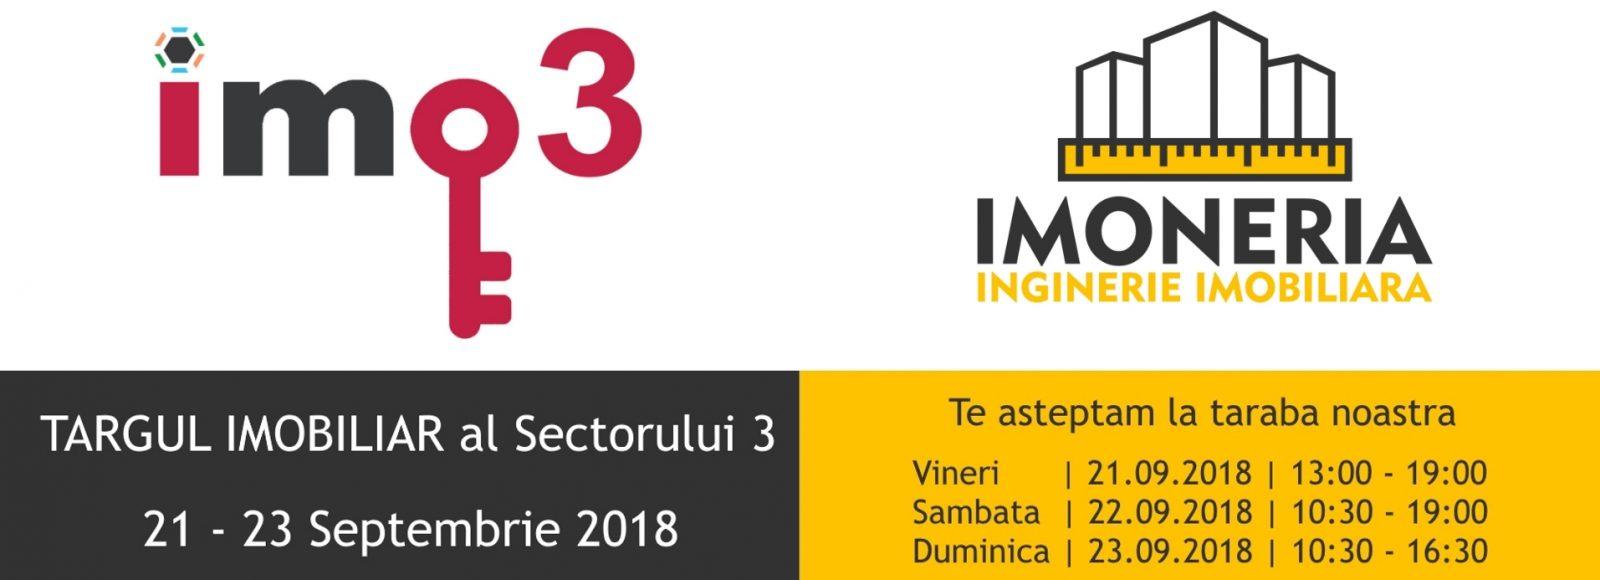 IMO3 targ imobiliar sector 3 imoneria incginerie imobiliara 3